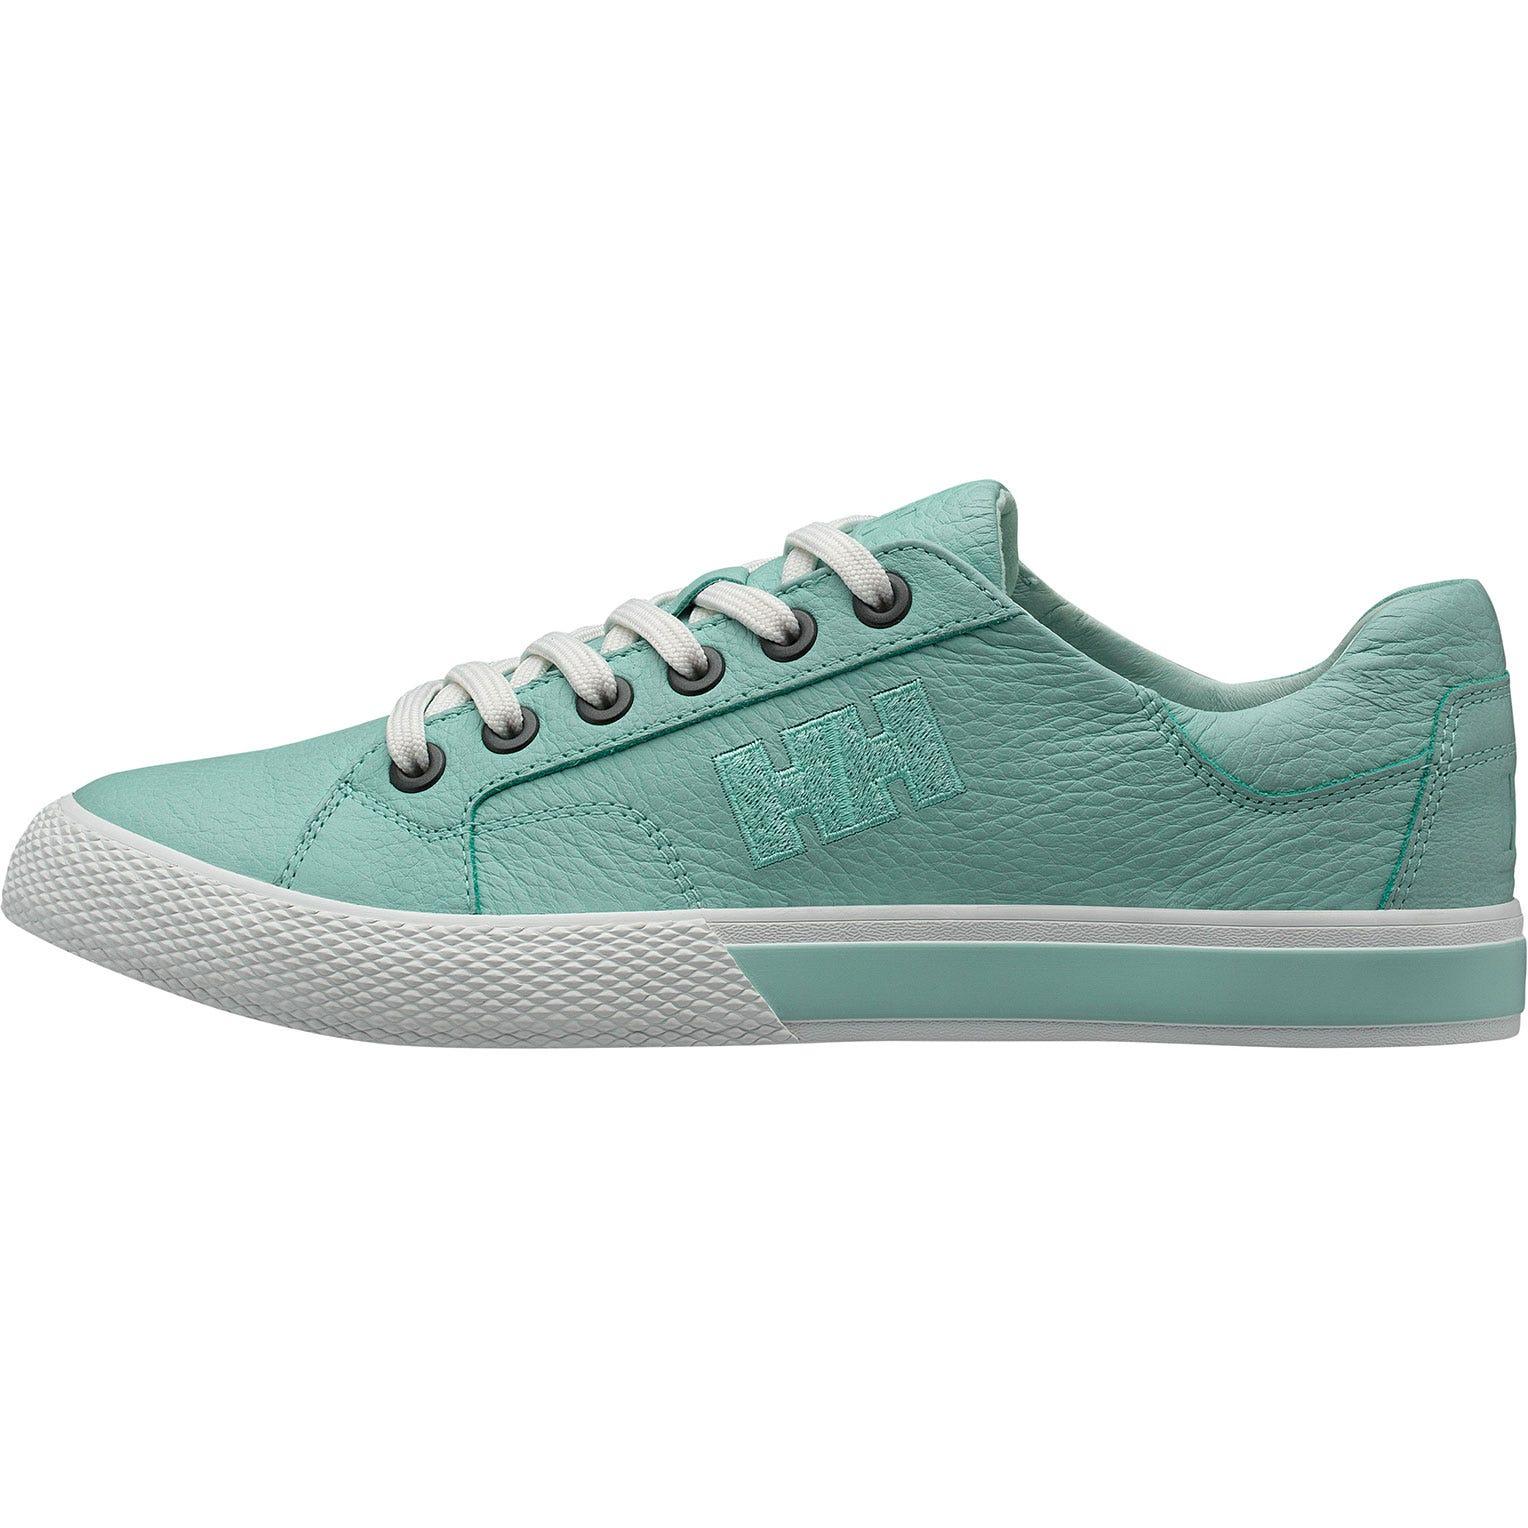 Helly Hansen W Fjord Lv2 Womens Casual Shoe Blue 37/6